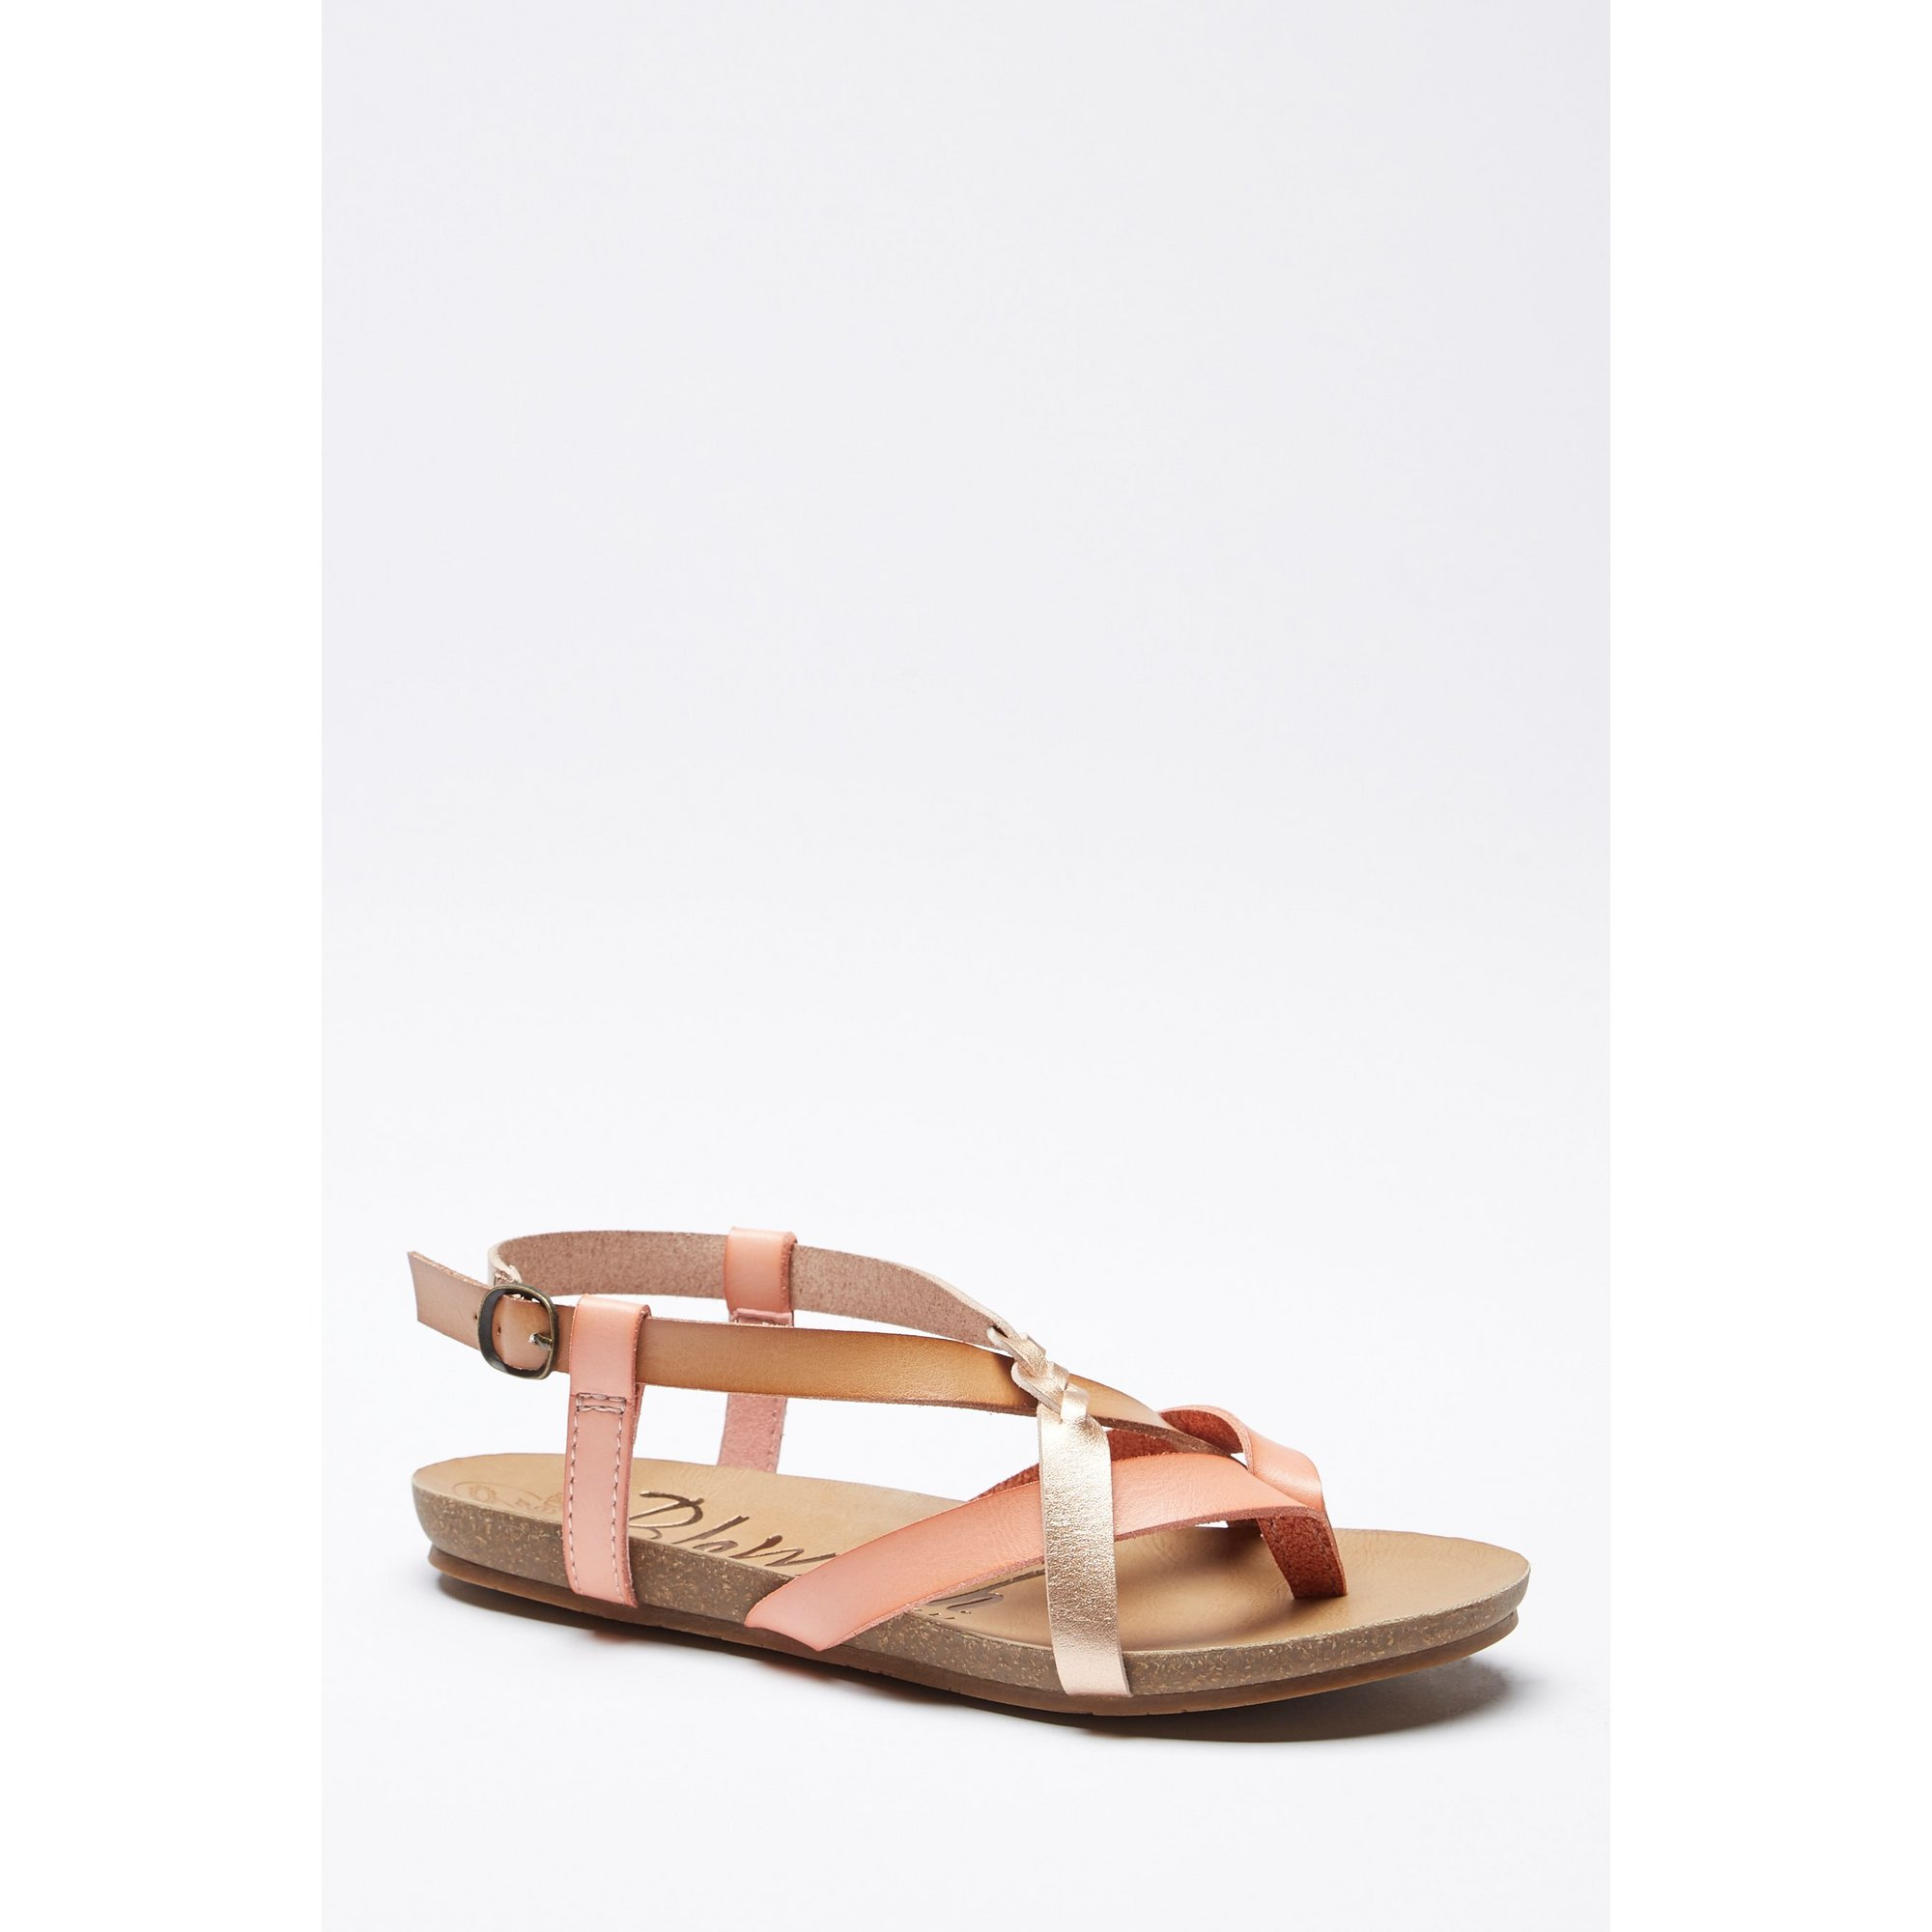 Image of Blowfish Granola B Rose Gold Sandals